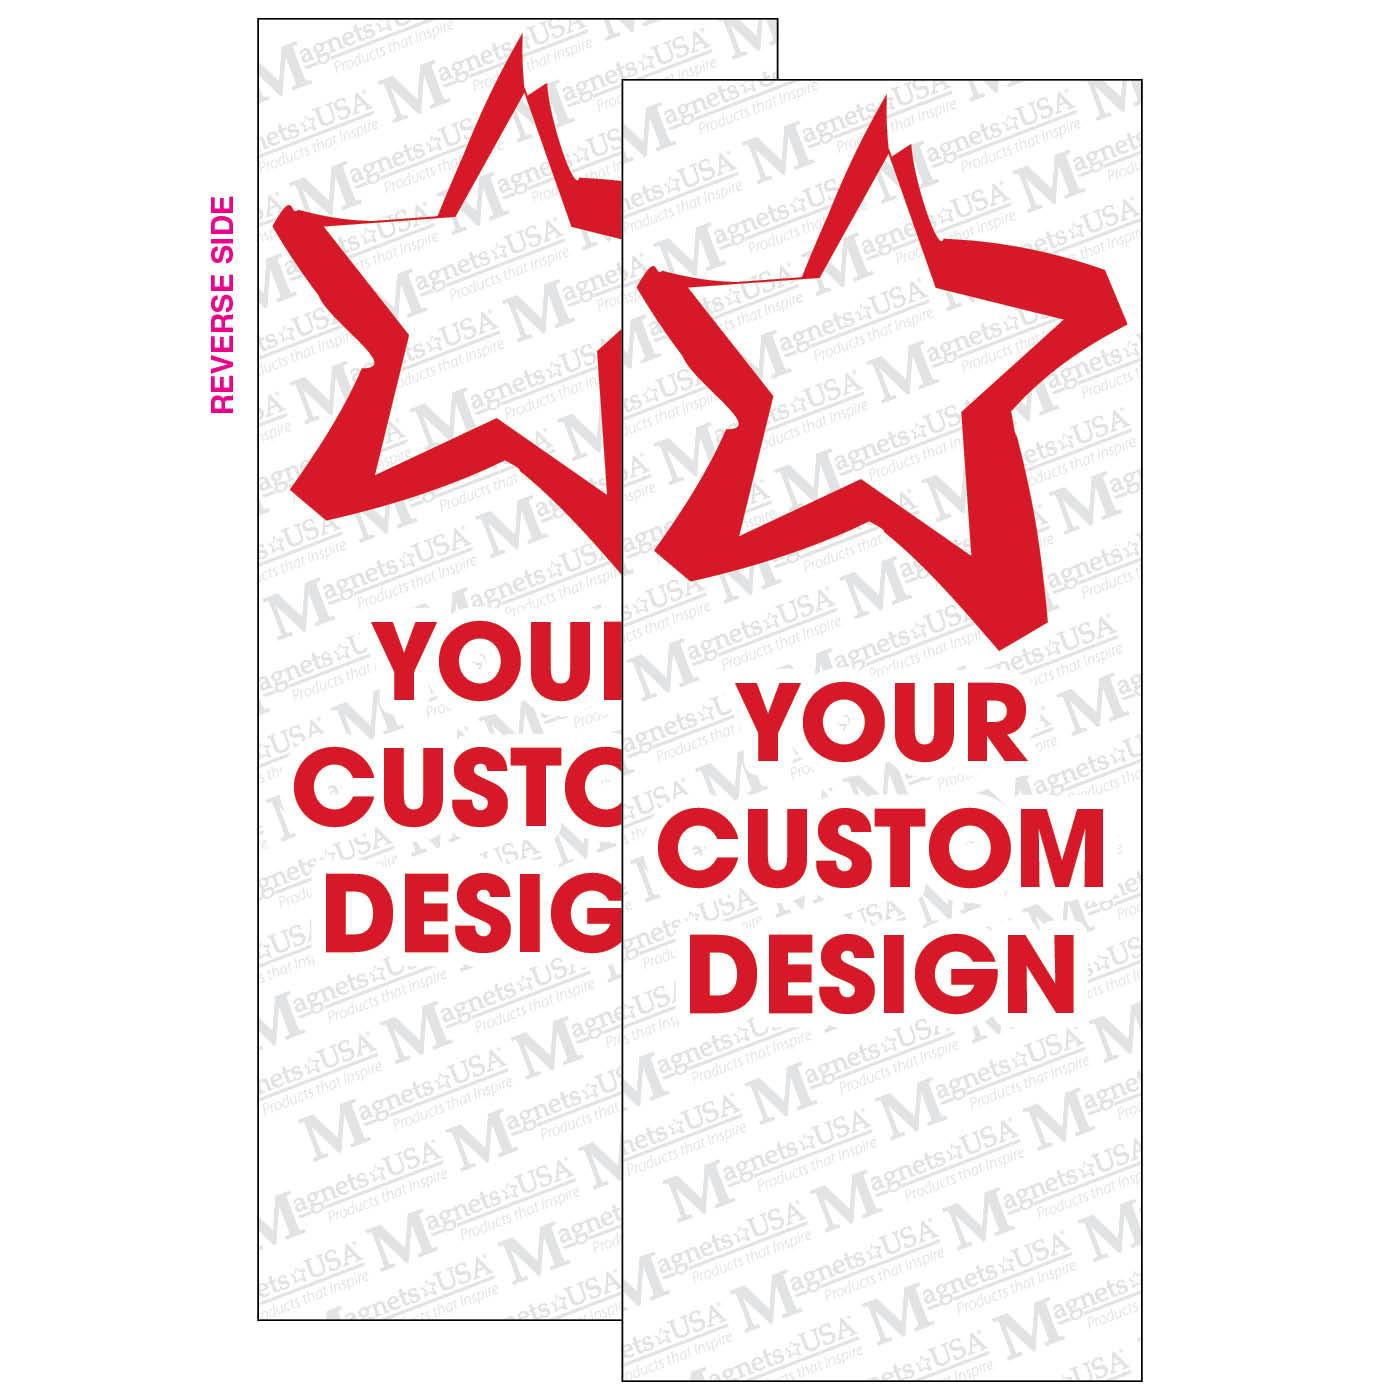 Custom EDDM Mailing Piece